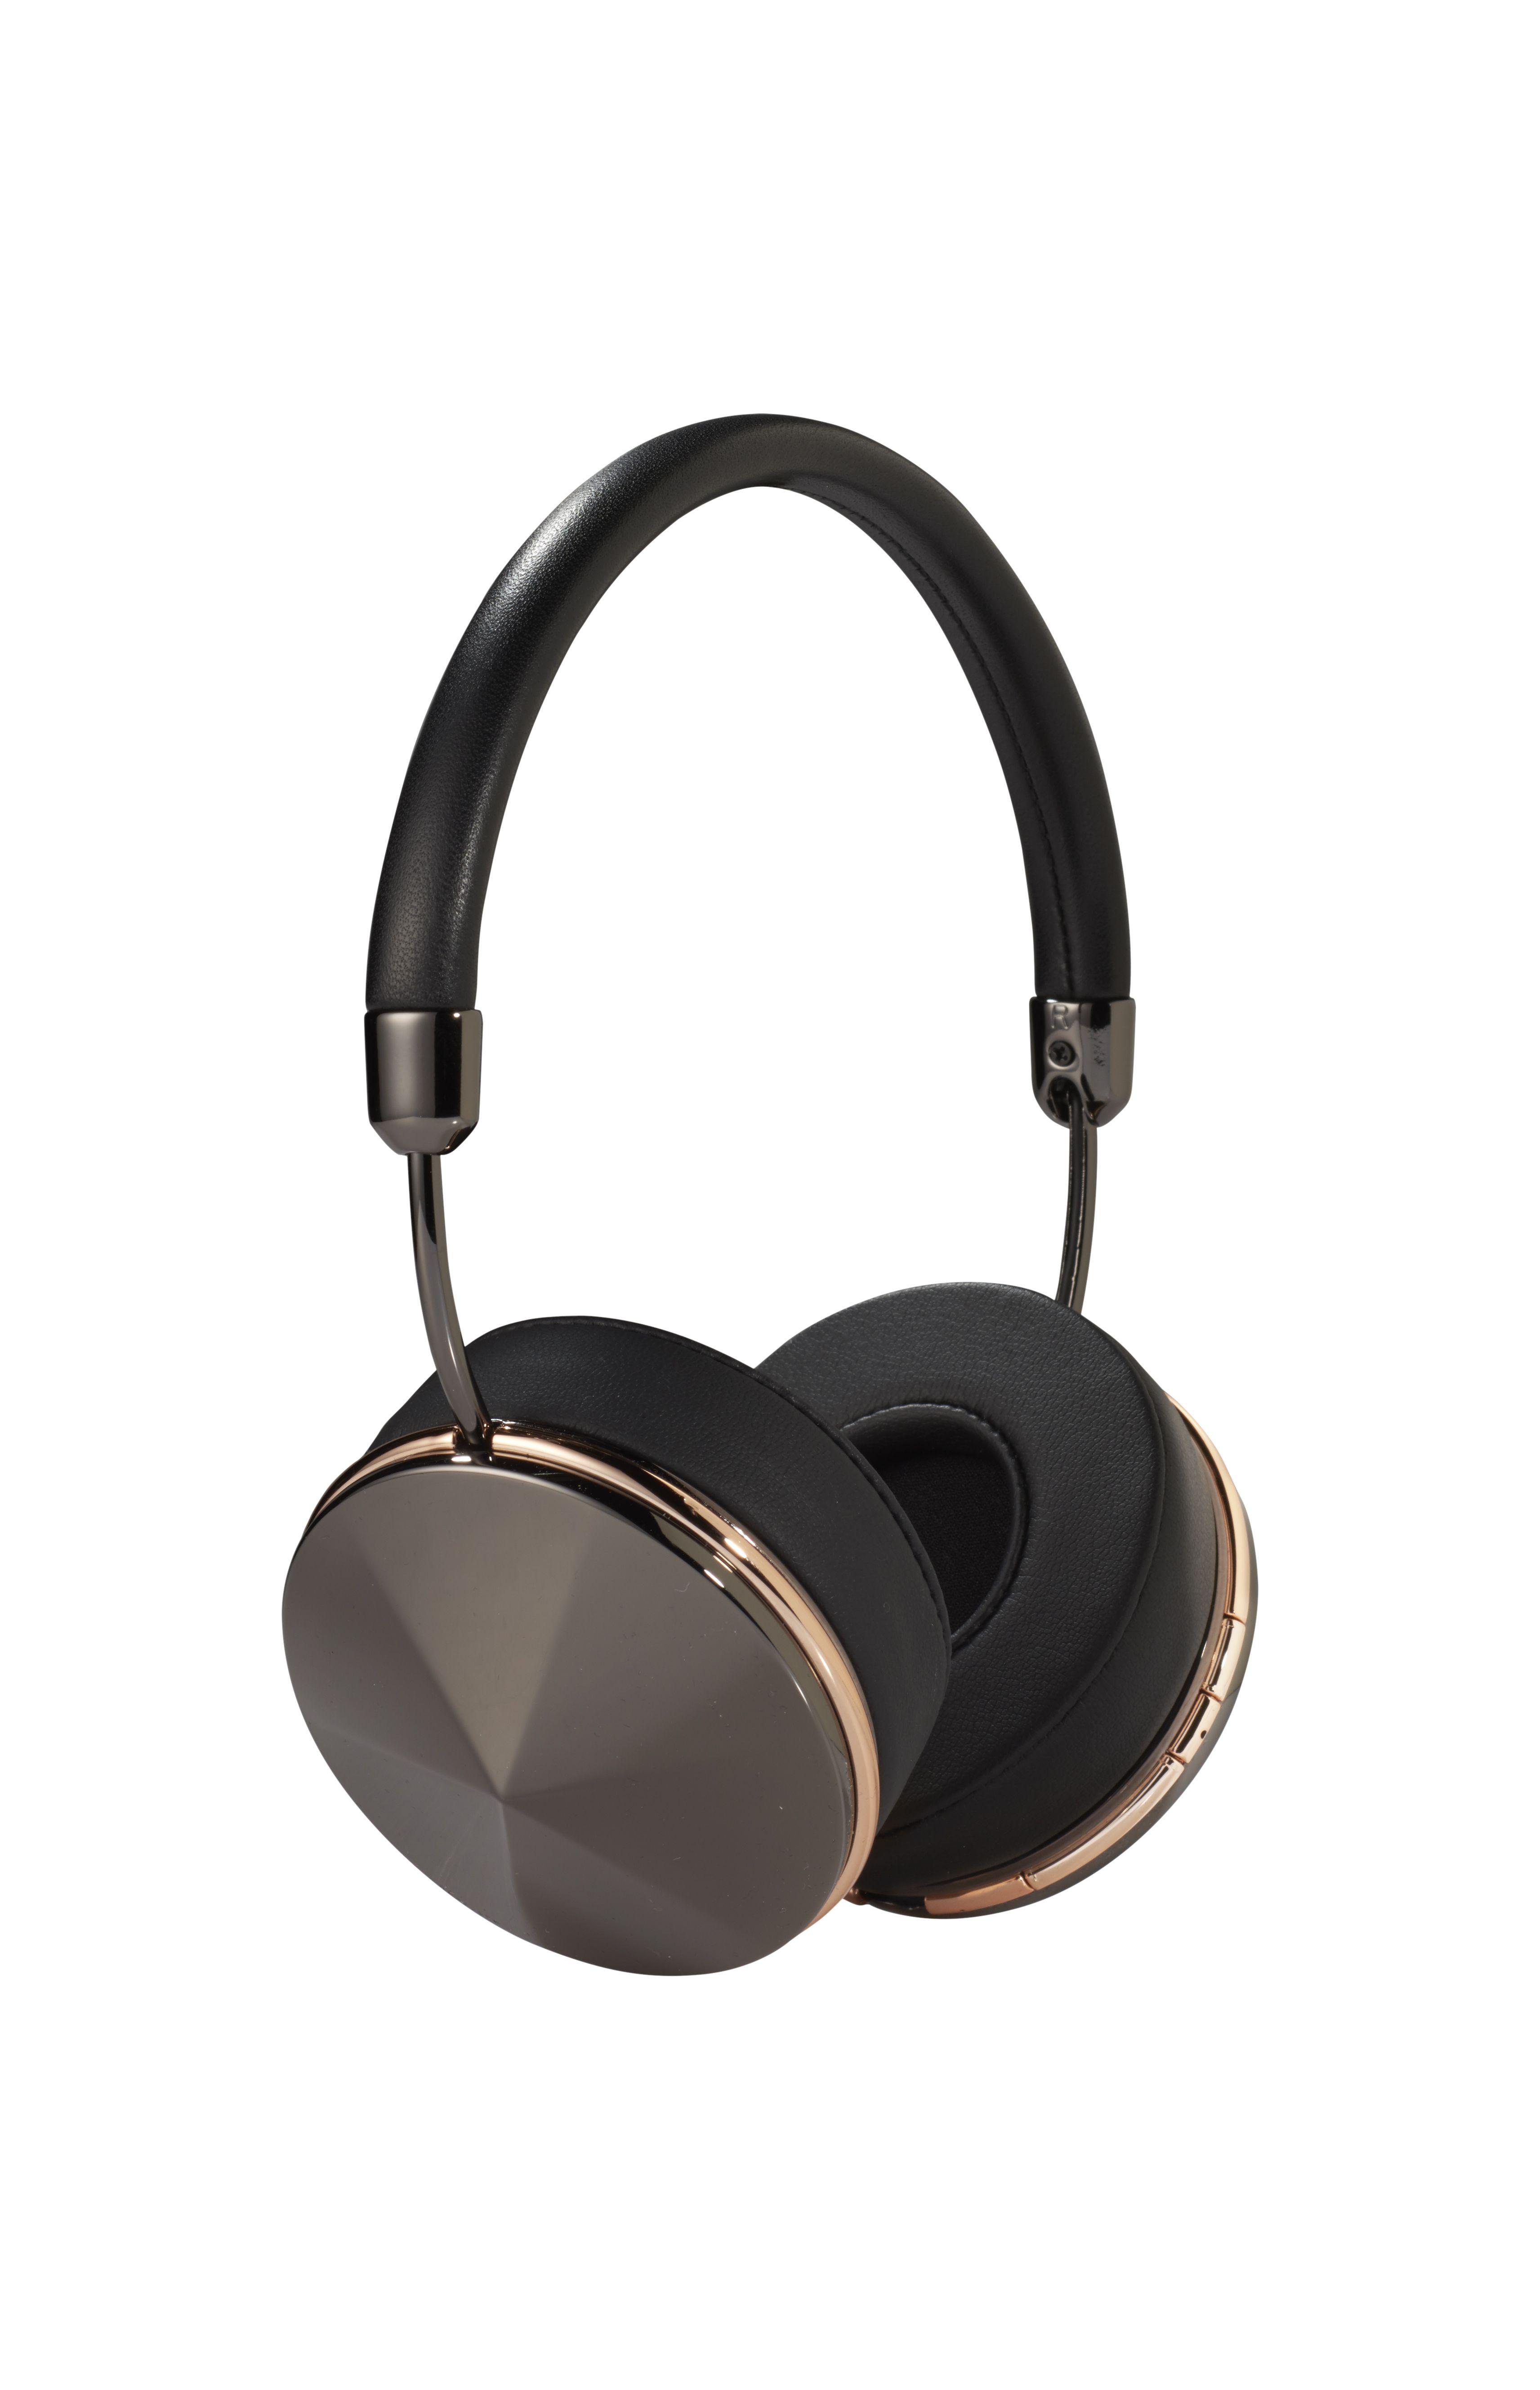 Frends Taylor Gunmetal Wireless Headphone Frends Headphone Headphones Frends Headphones Taylor